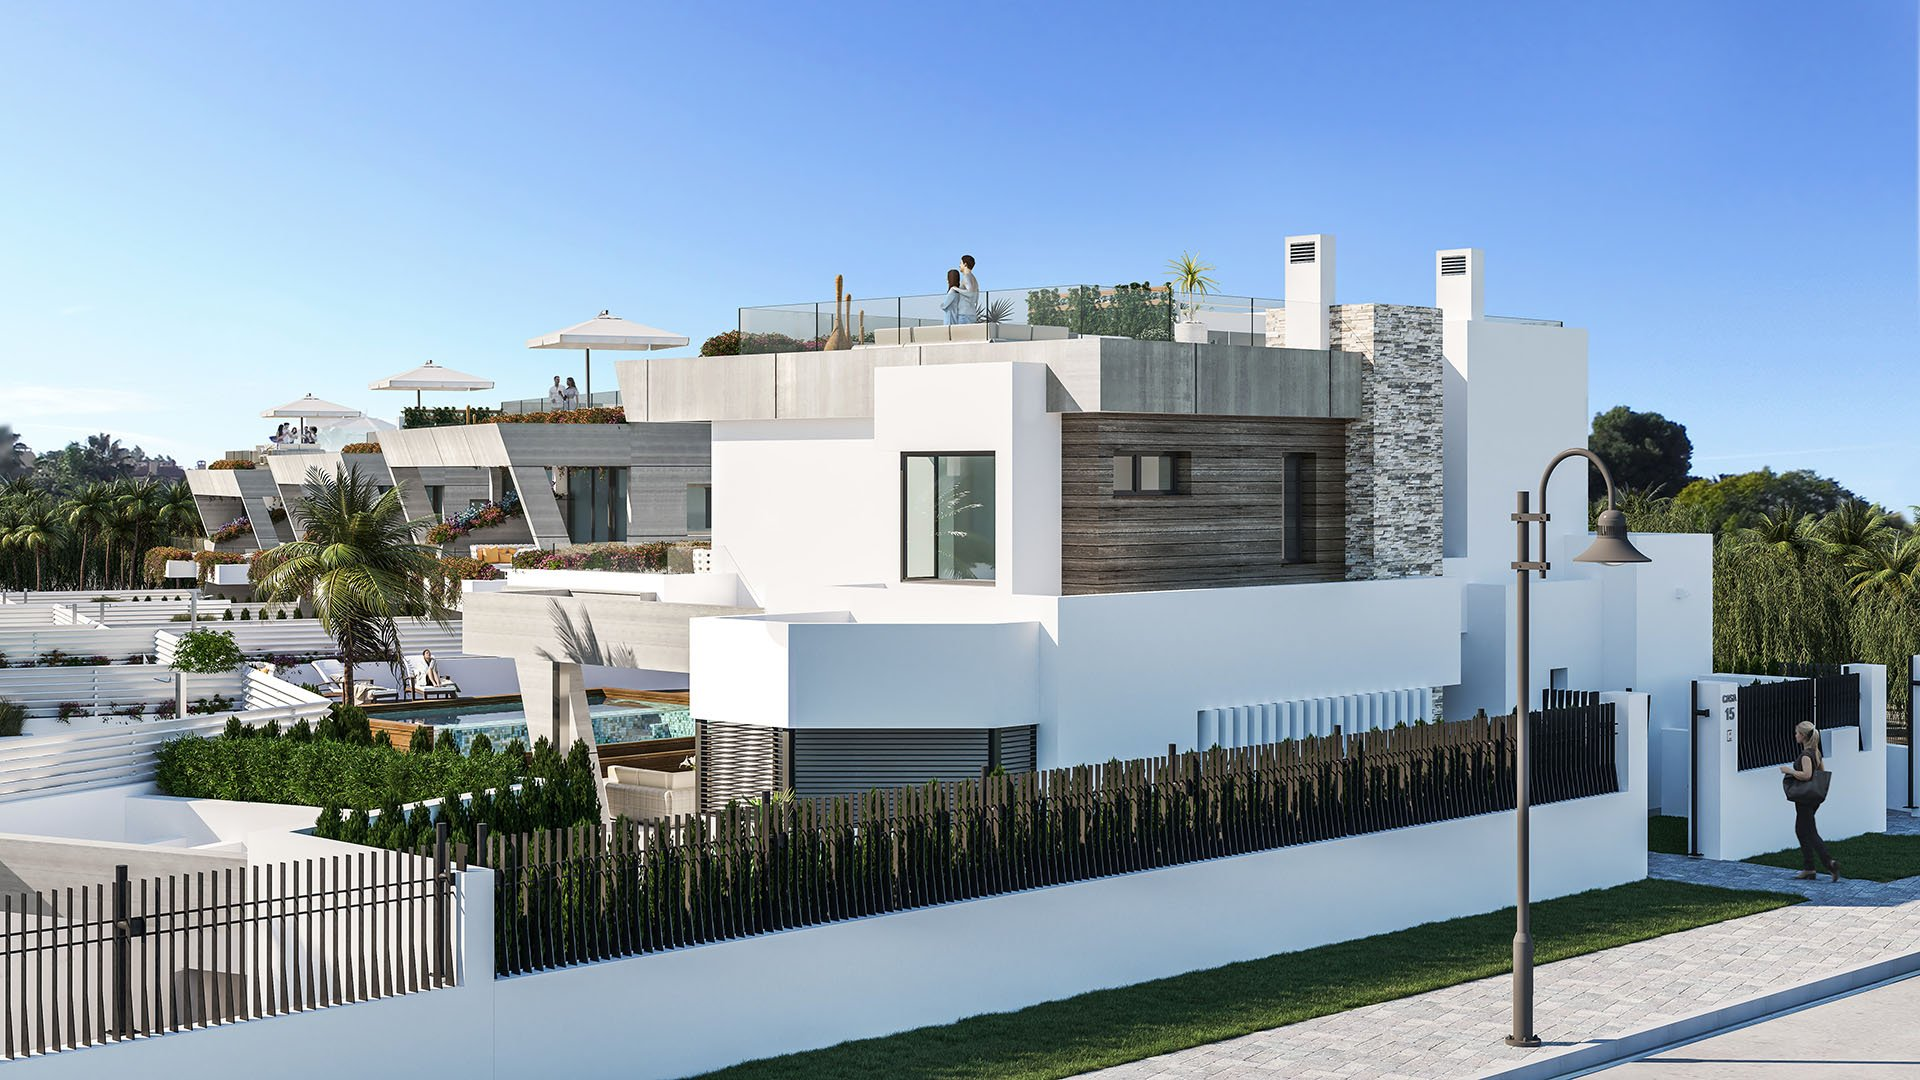 Banus Bay: Houses in Puerto Banús